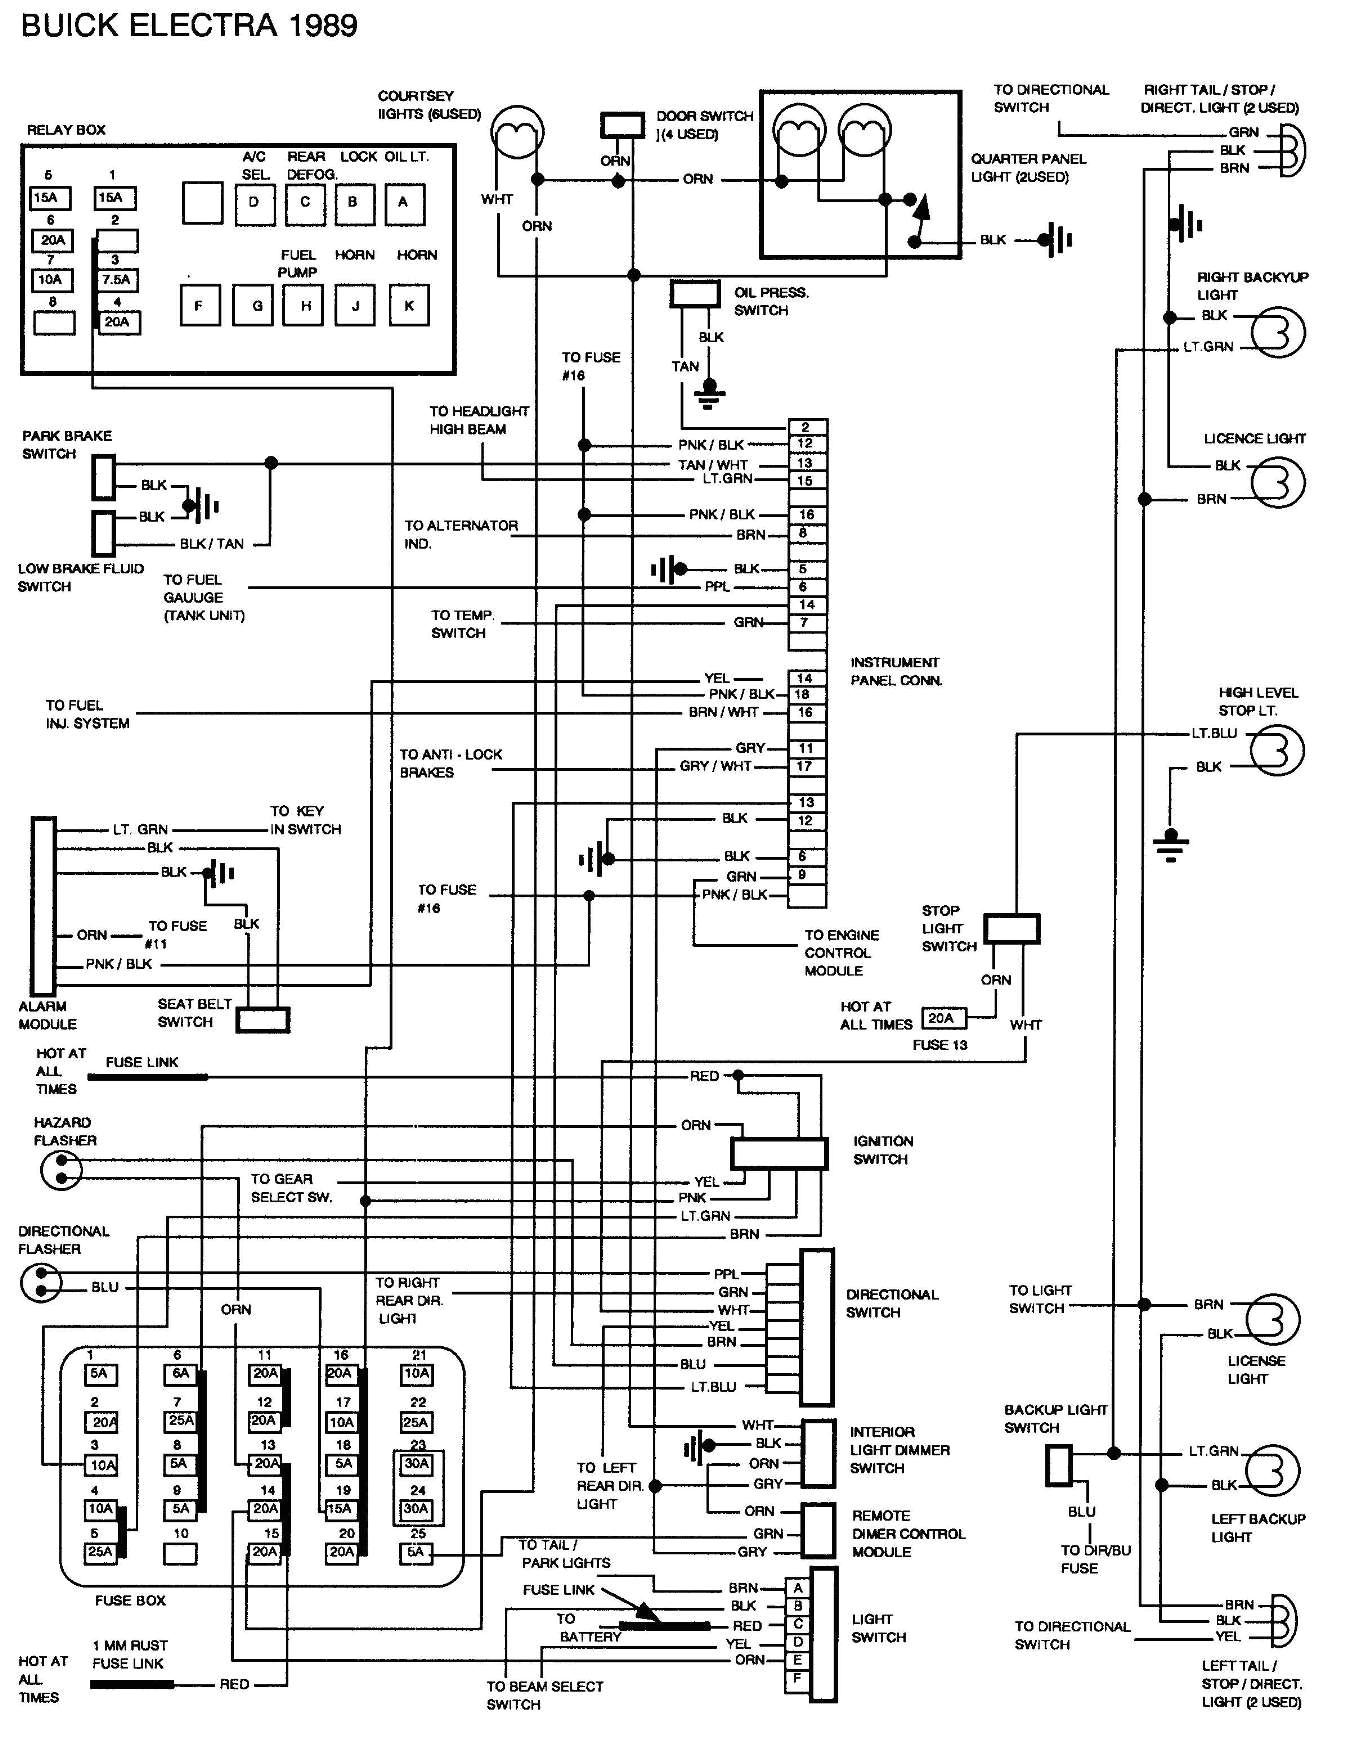 2006 buick rendezvous wiring diagram wiring diagram nameheadlamp relay wiring diagram buick 2005 search wiring diagram